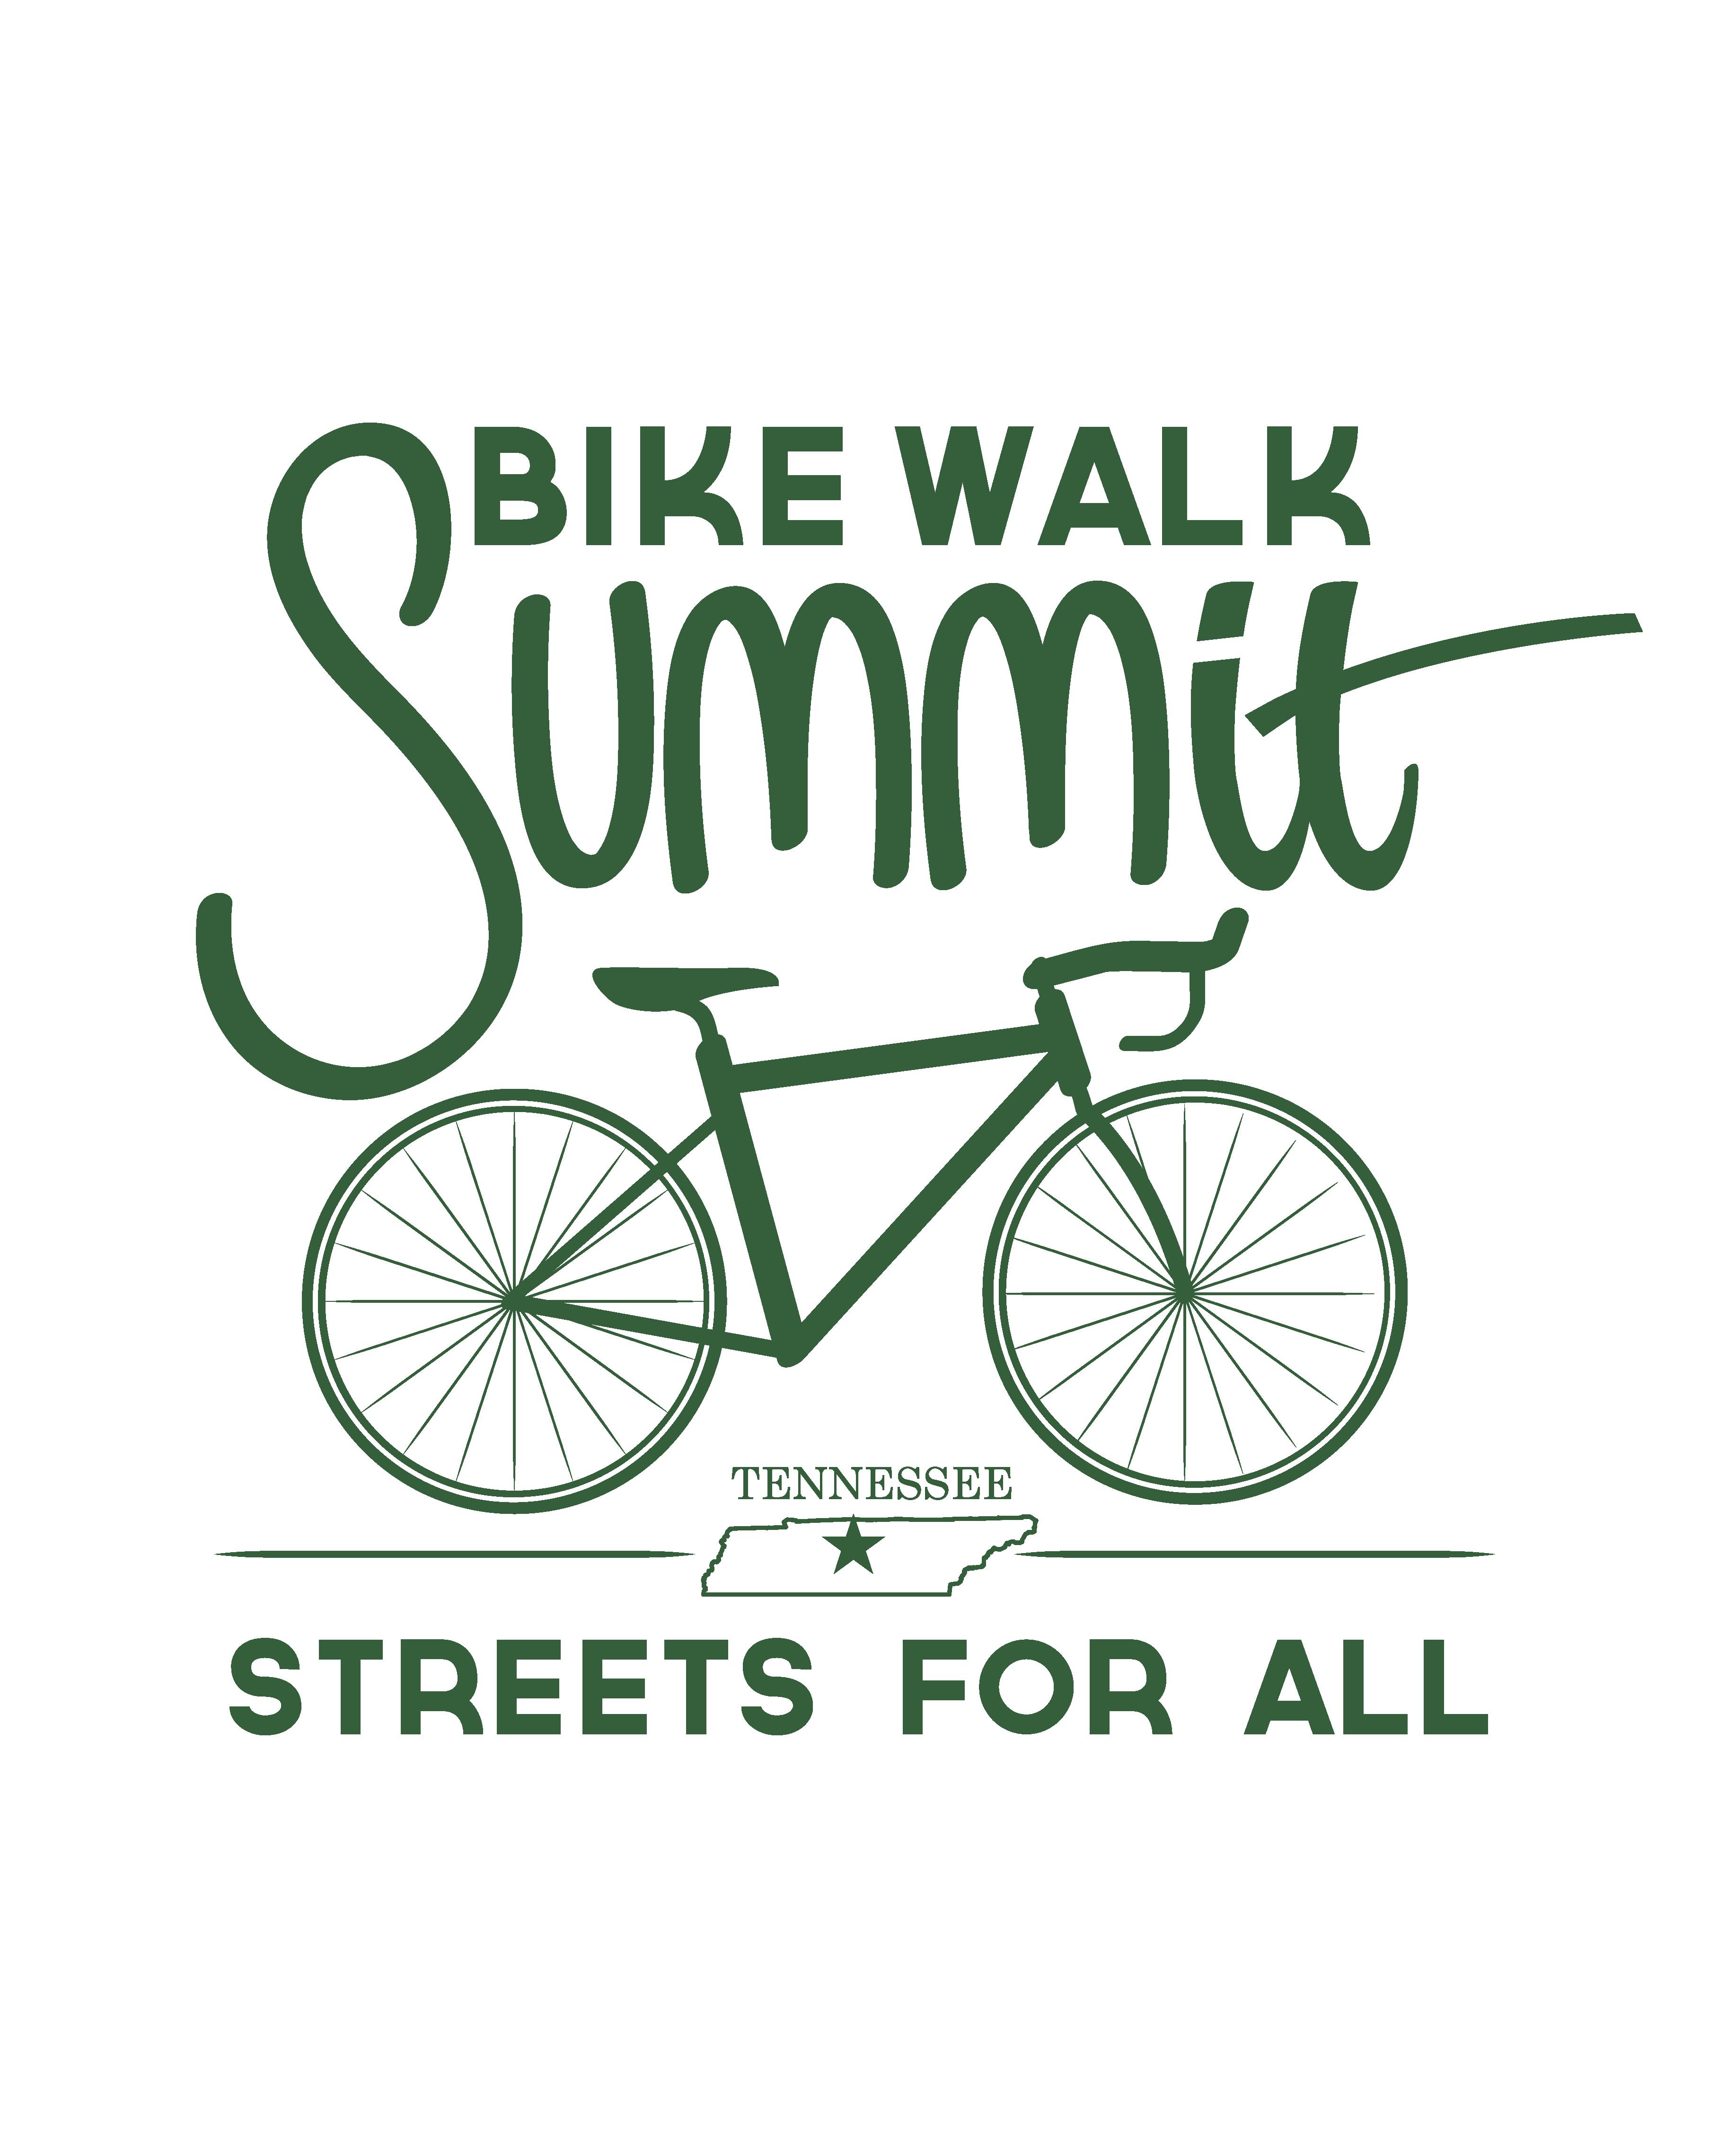 graphic freeuse download Blog bike walk tn. Walking on sidewalk clipart